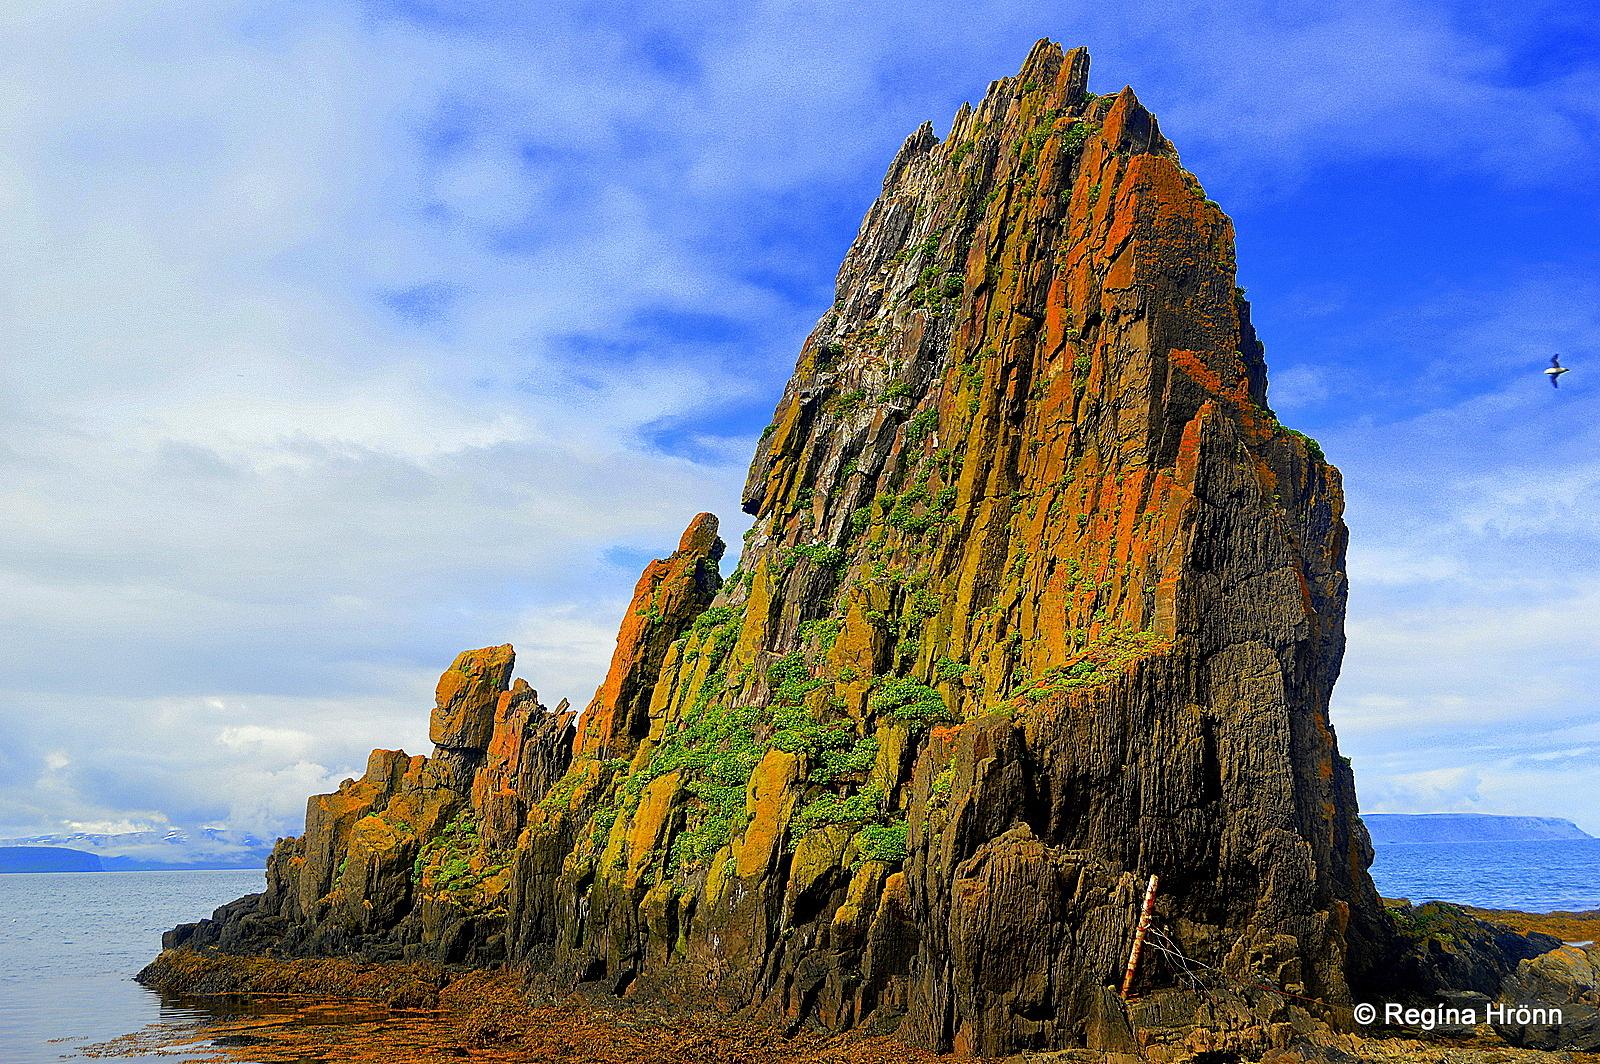 Elephant Rock Prince Edward Island 1996